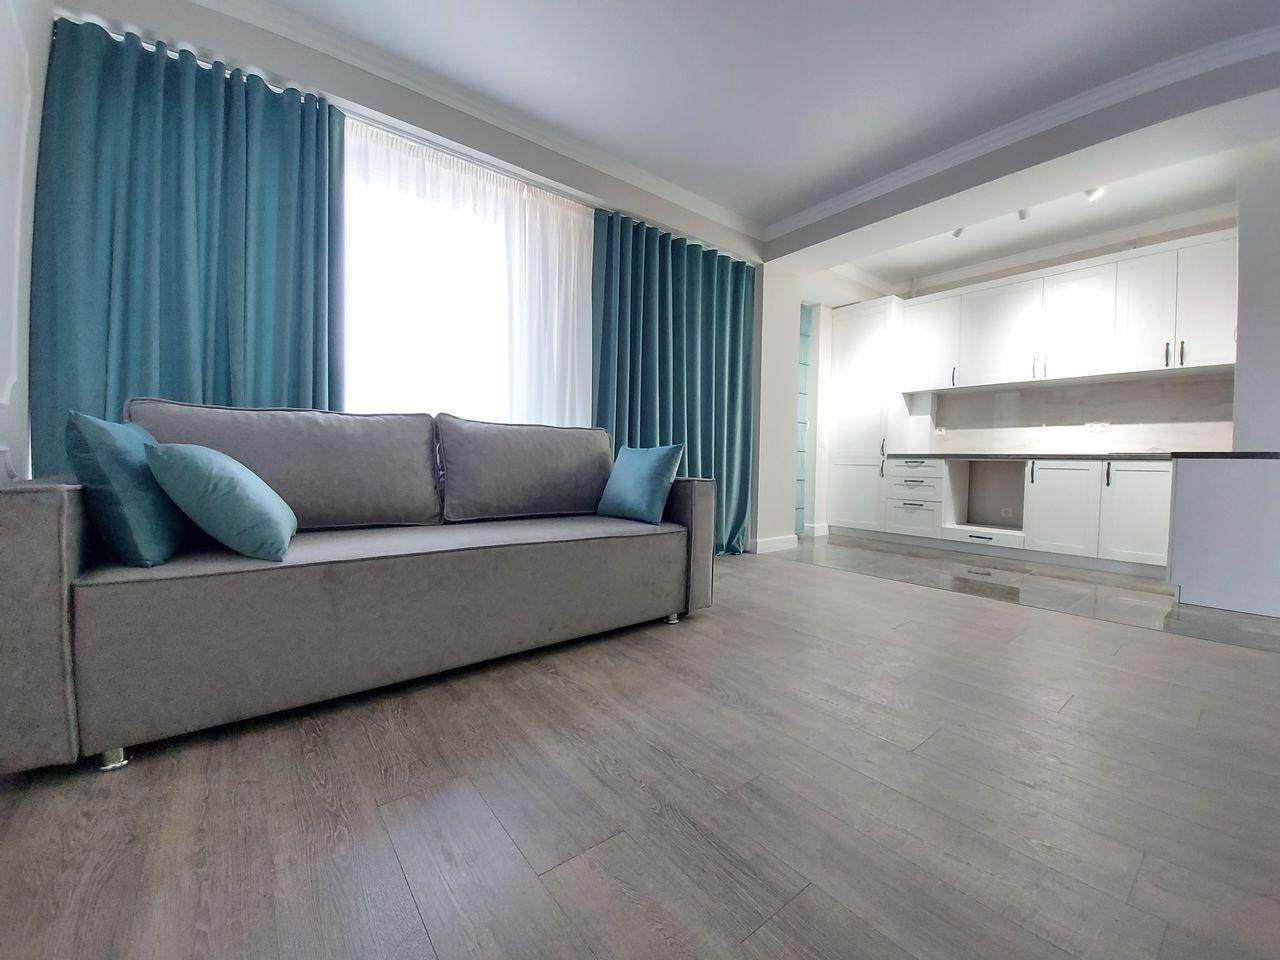 Apartament in centru Chisinaului – 2 camere + living